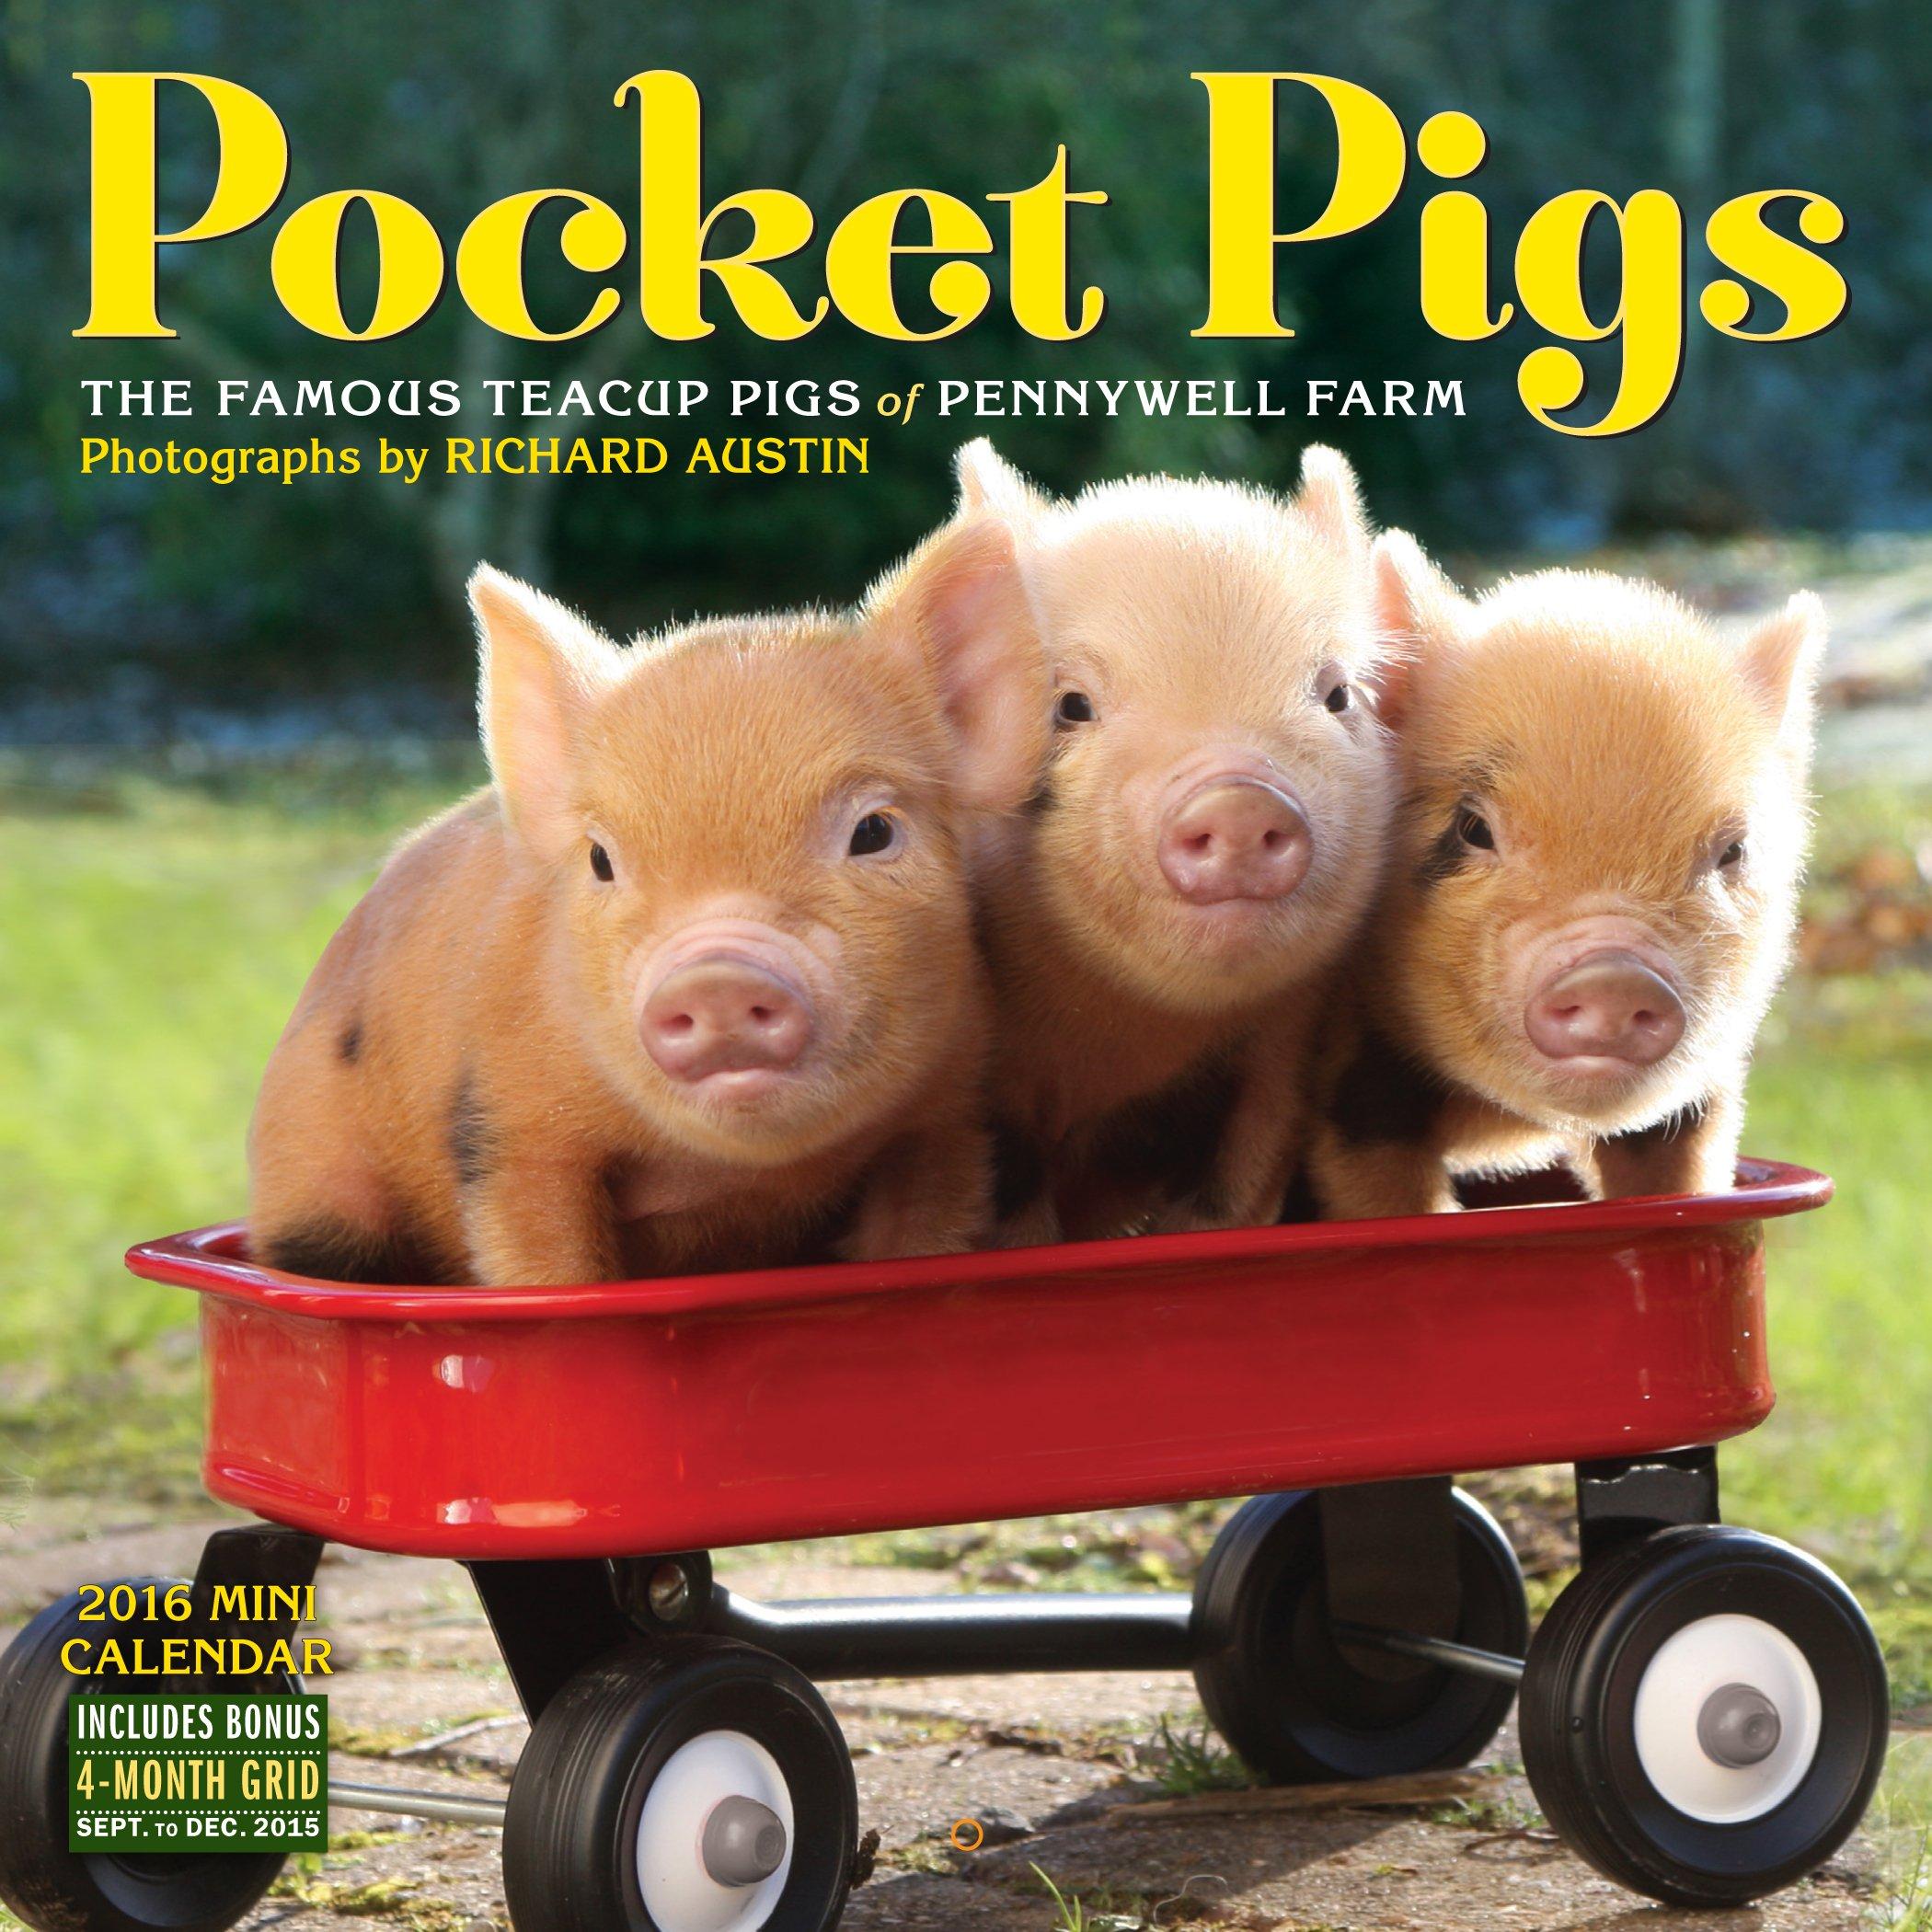 Pocket pigs mini wall calendar 2016 richard austin 9780761184928 pocket pigs mini wall calendar 2016 richard austin 9780761184928 amazon books voltagebd Choice Image